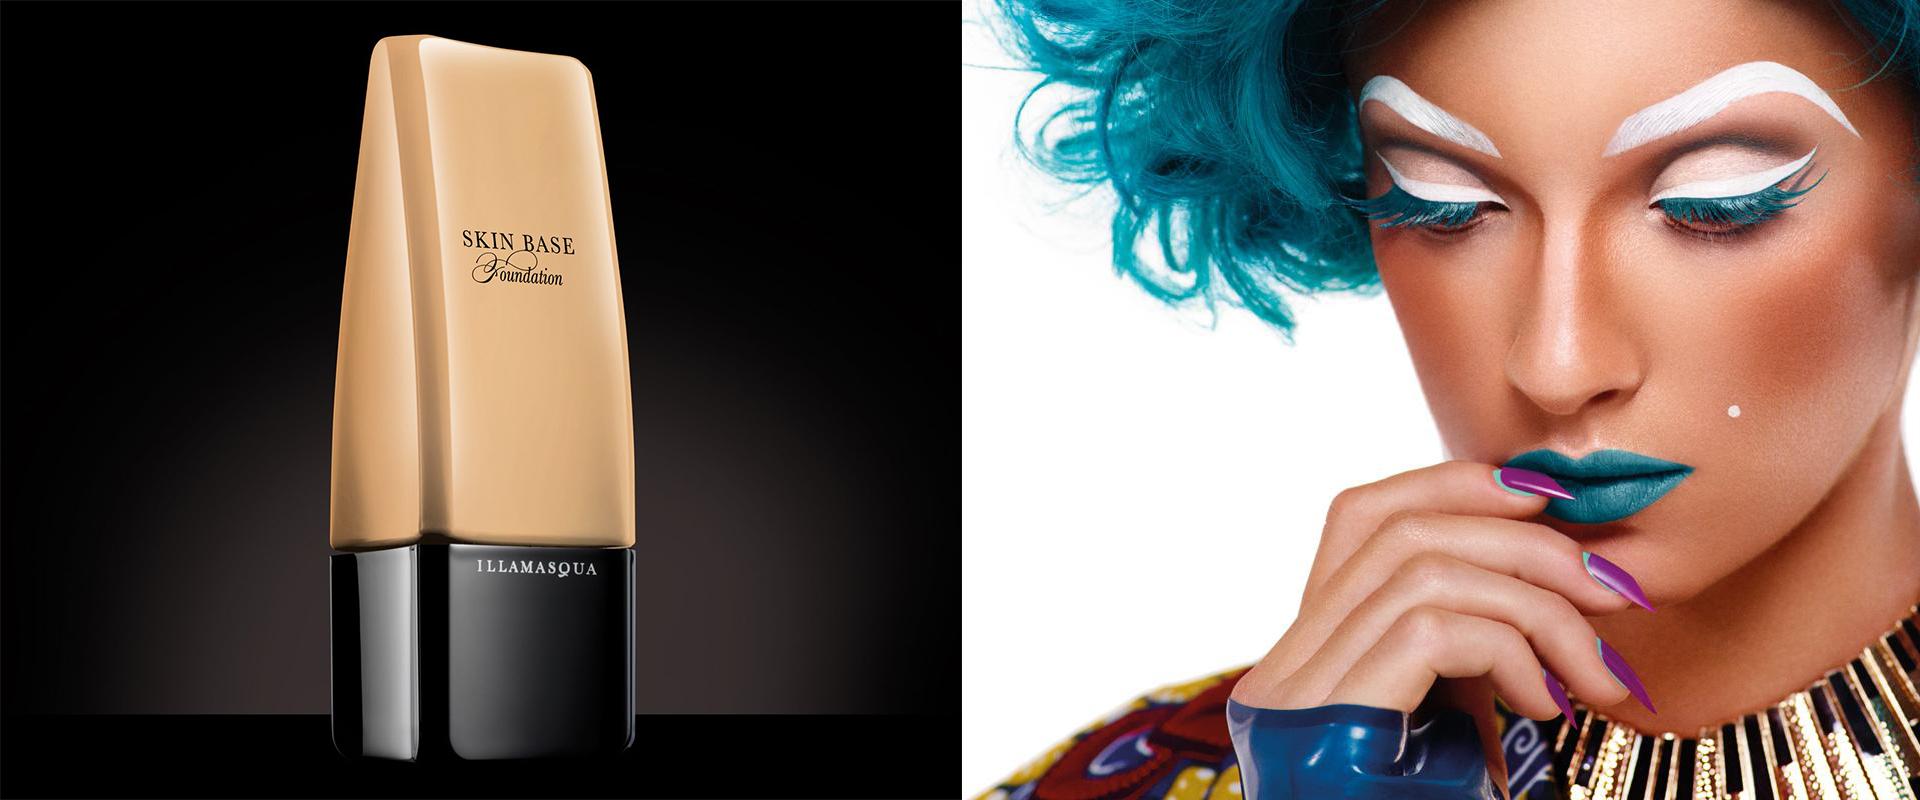 Illamasqua - curventa - makeup - range - brand - beauty - foundation - creative - skin base